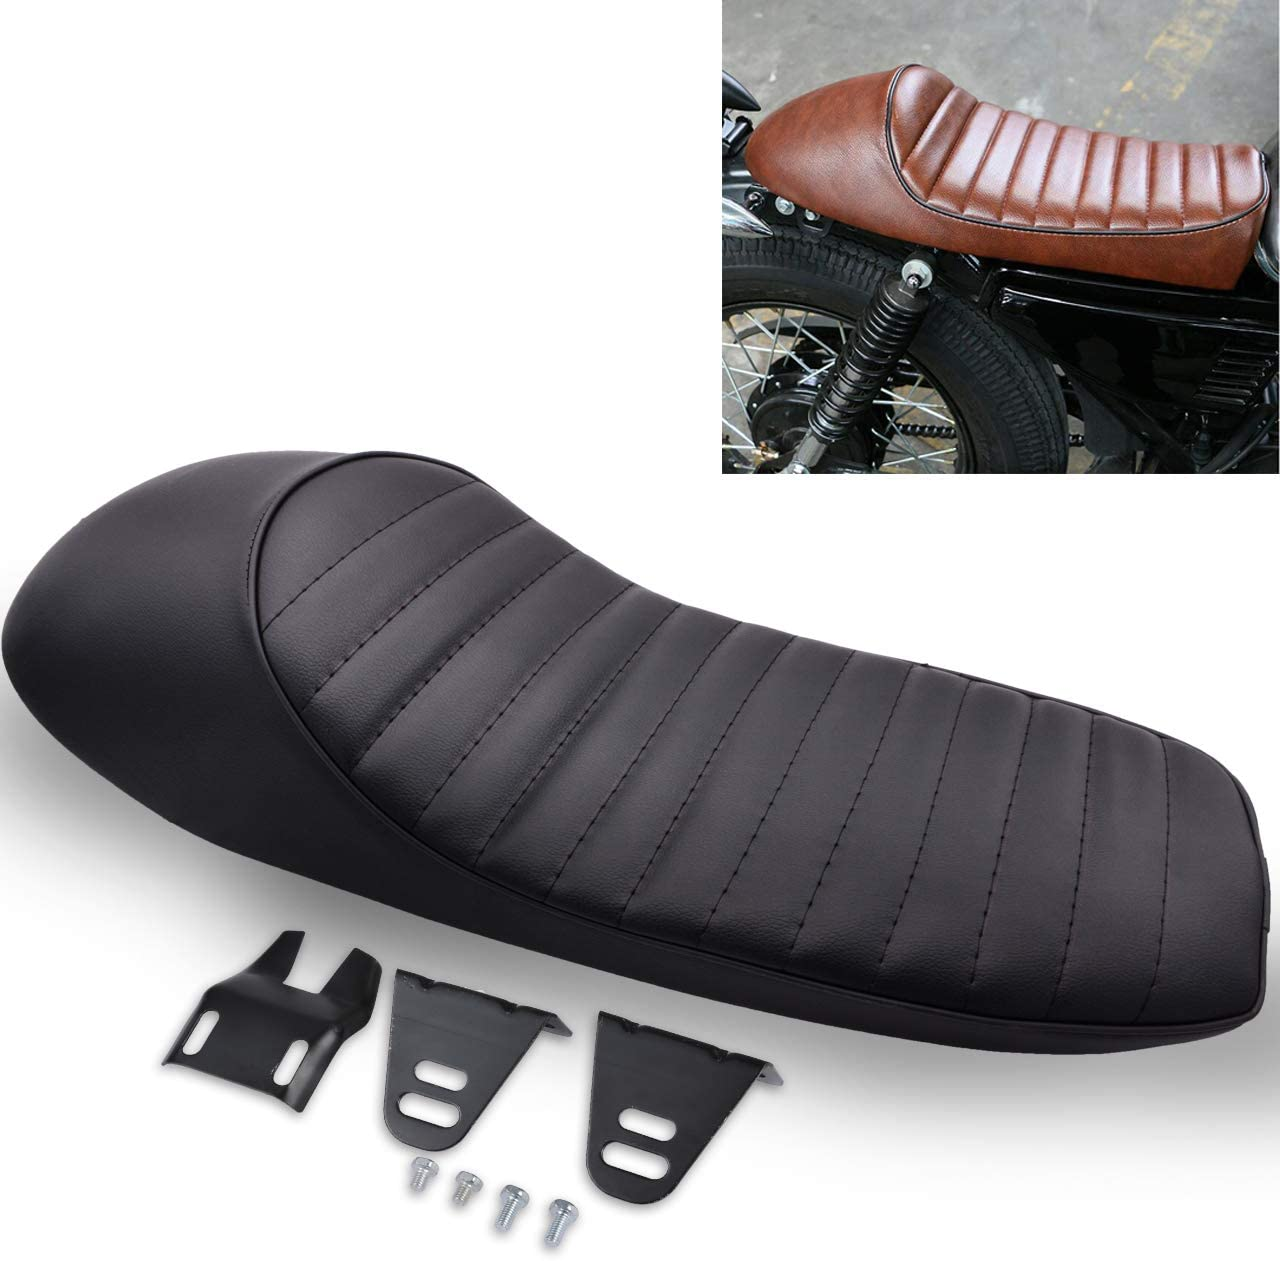 Katur Motorrad Cafe Racer Sitz Hump 24 5 Vintage Sattel Sitze Für Honda Cb Gb Gl Cbr Suzuki Gs Yamaha Xj Xj550 Xt500 Xs650 Sr500 Rd40 Auto